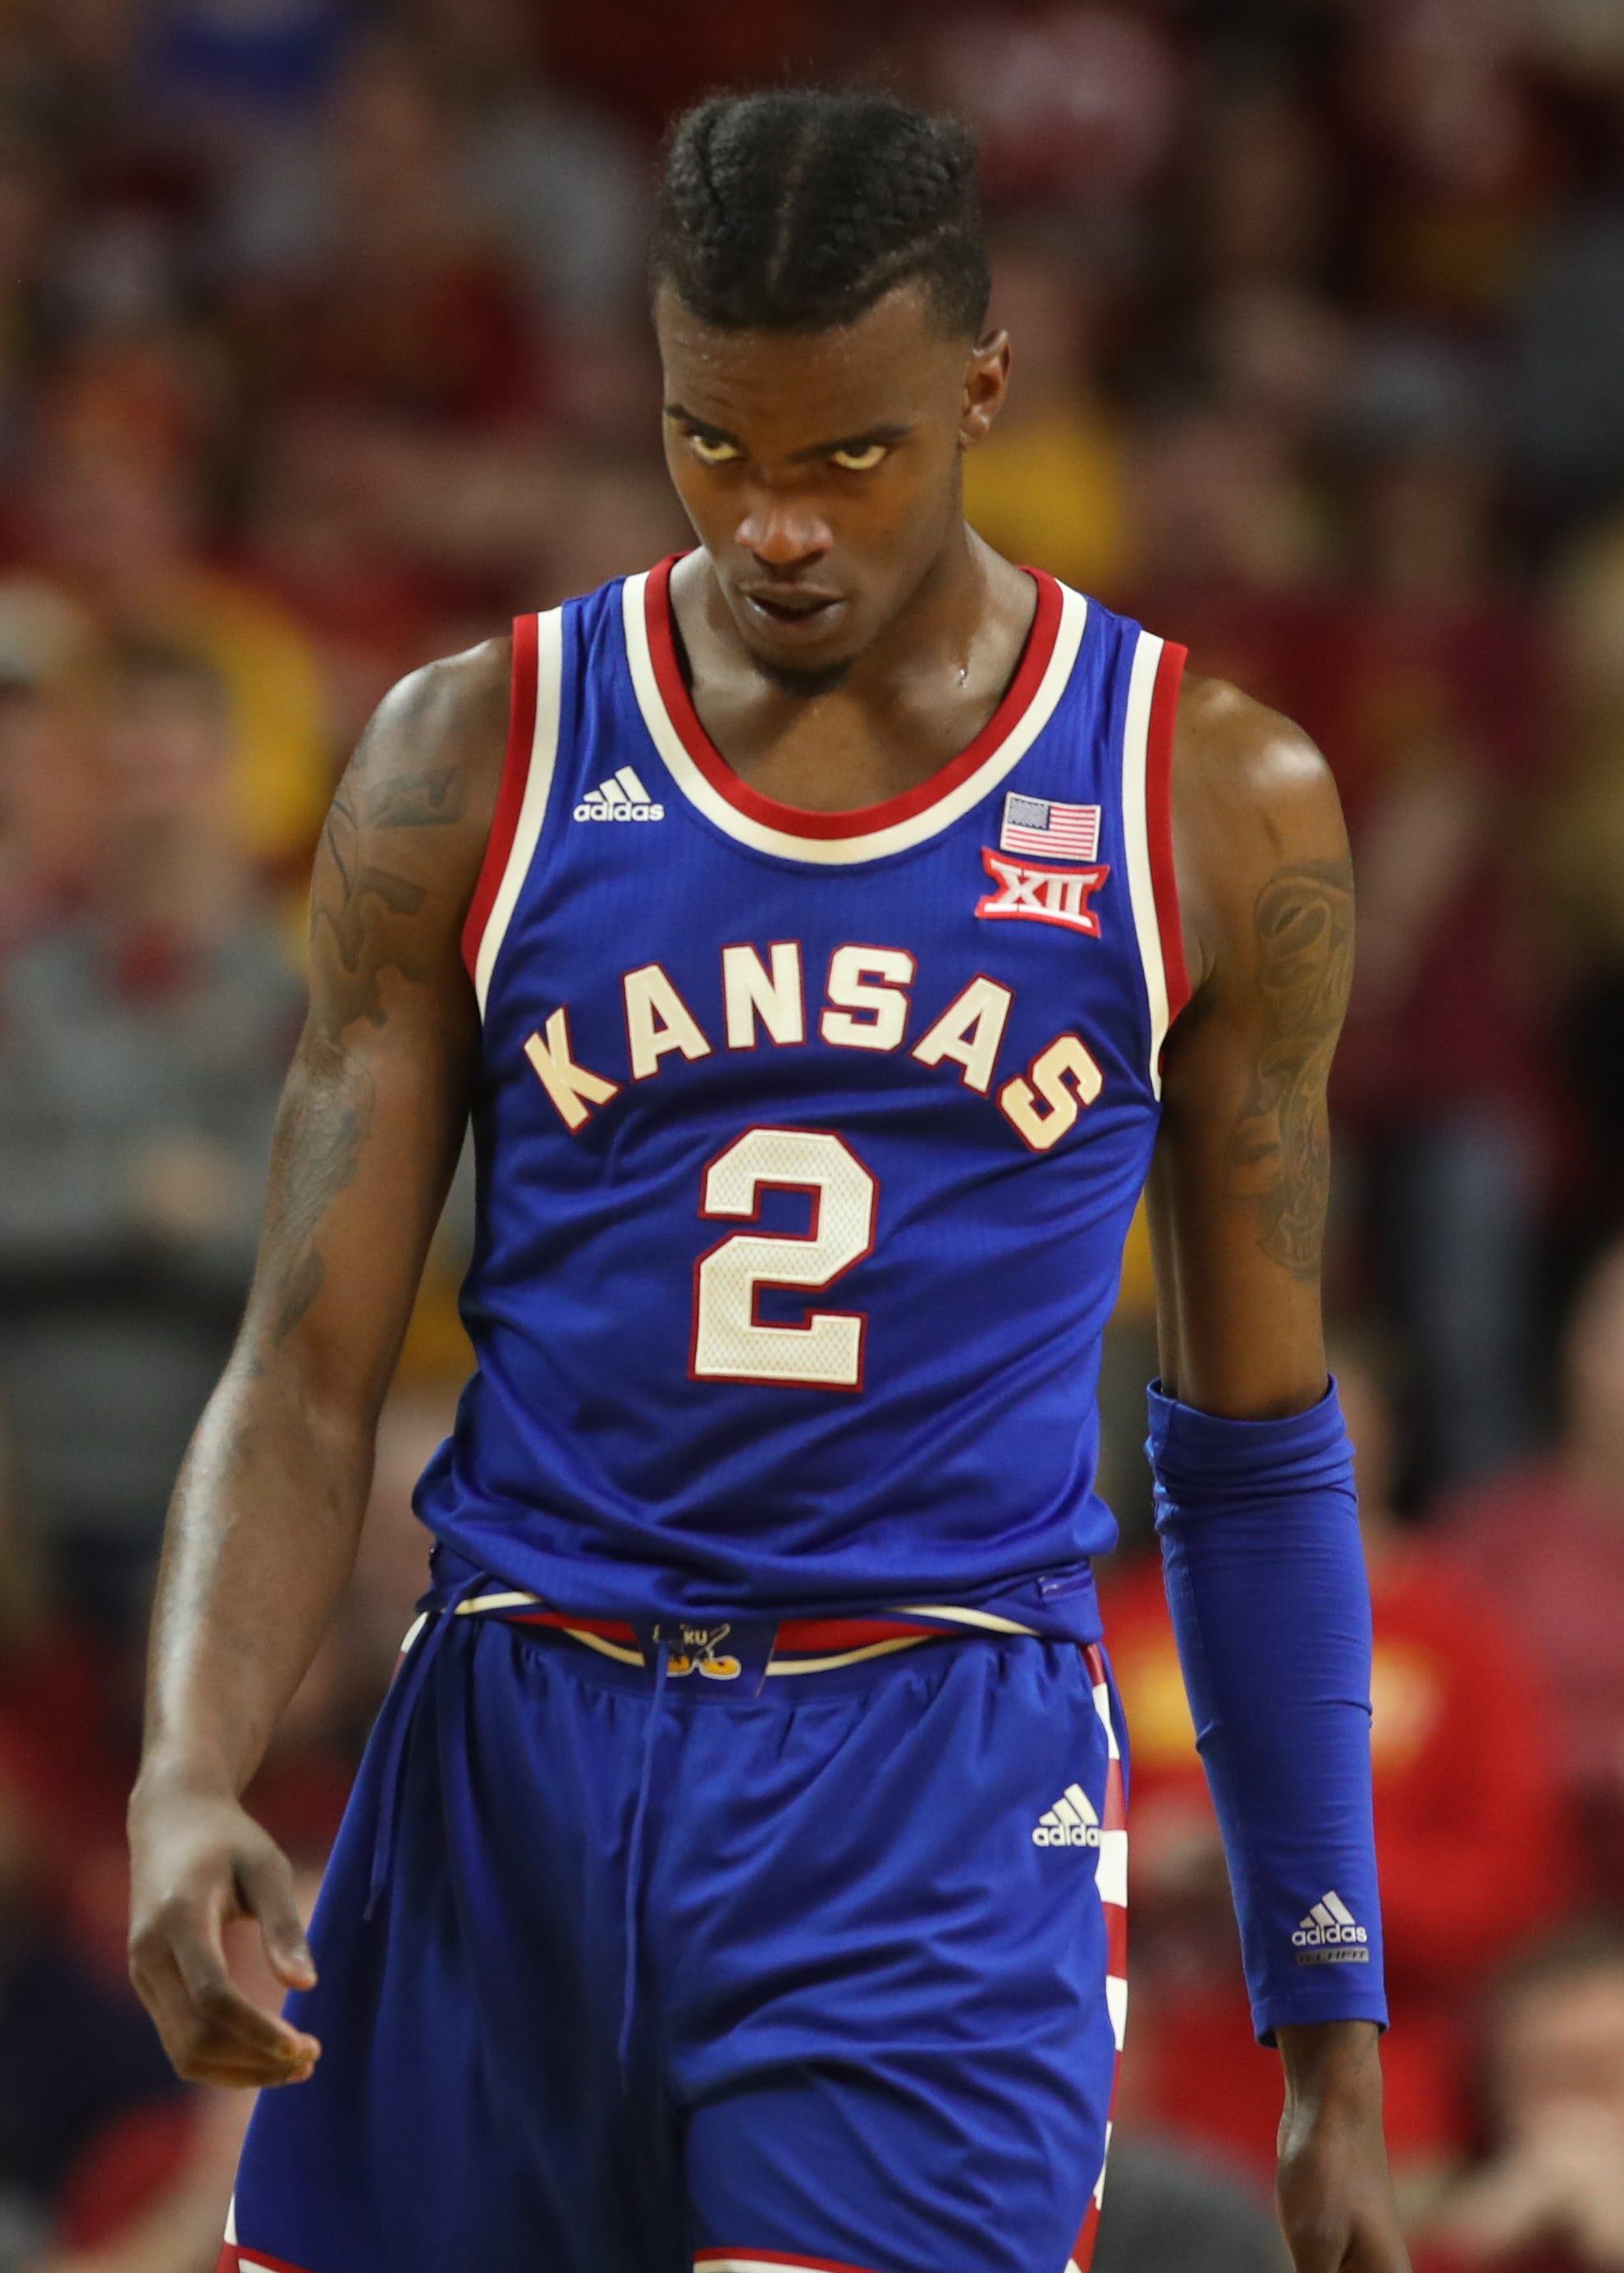 b0f4f0298b0 The post NCAA tournament bracketology  Kansas rises to No. 1